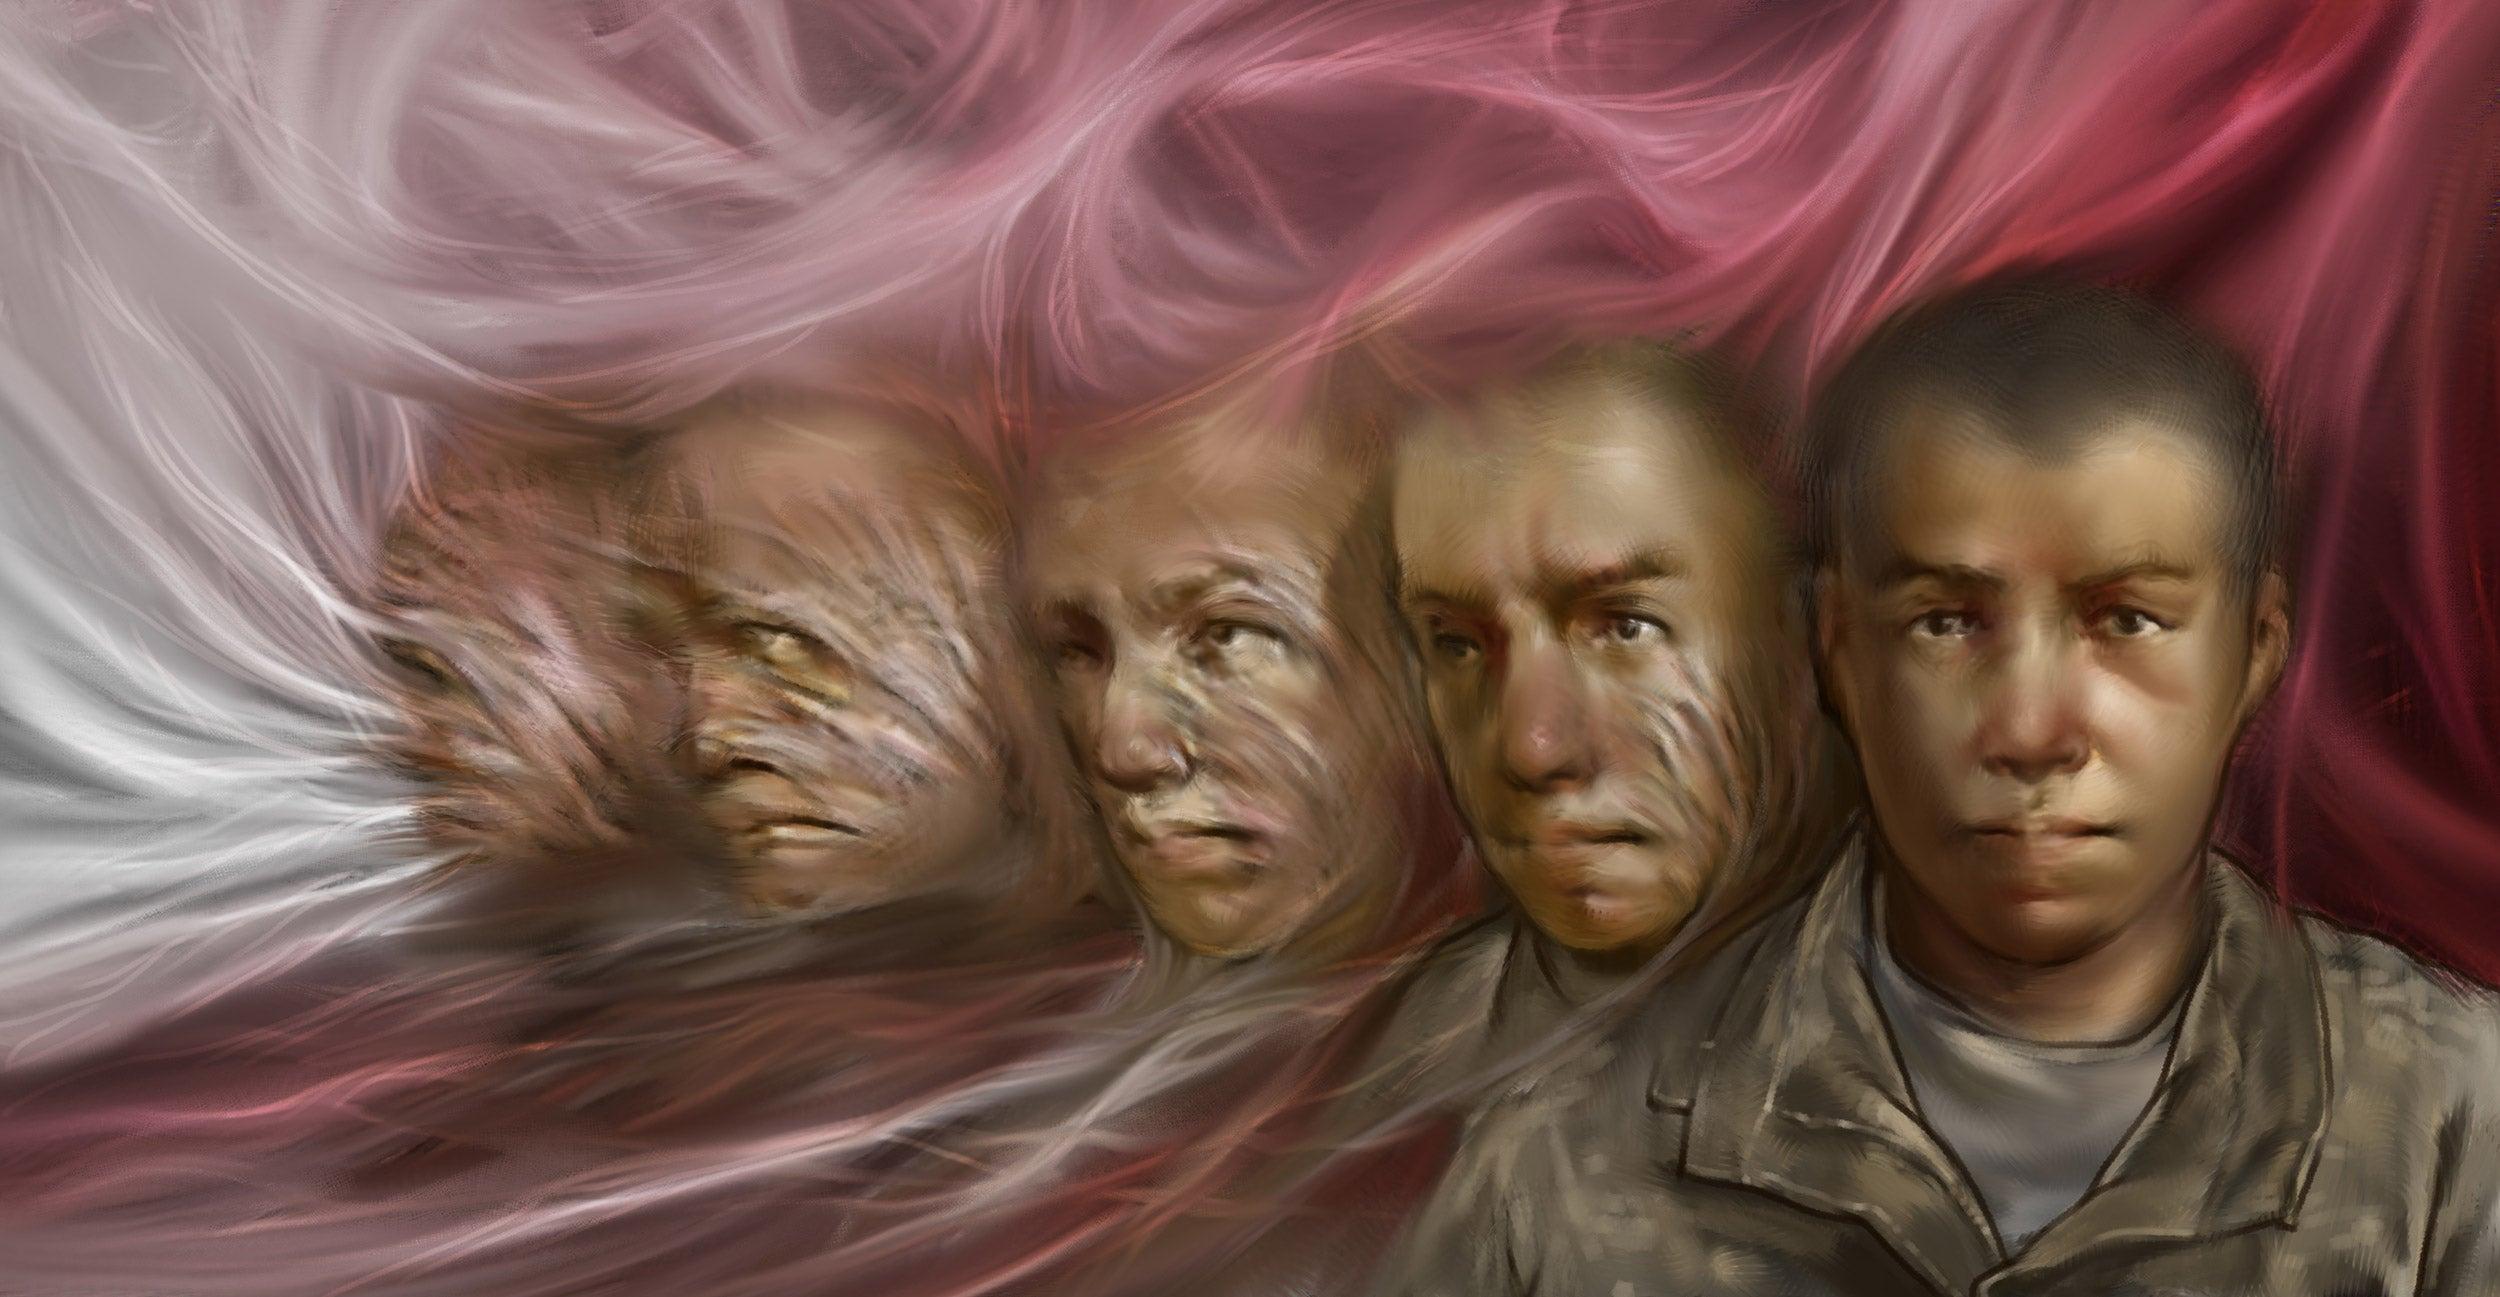 Illustration of face healing